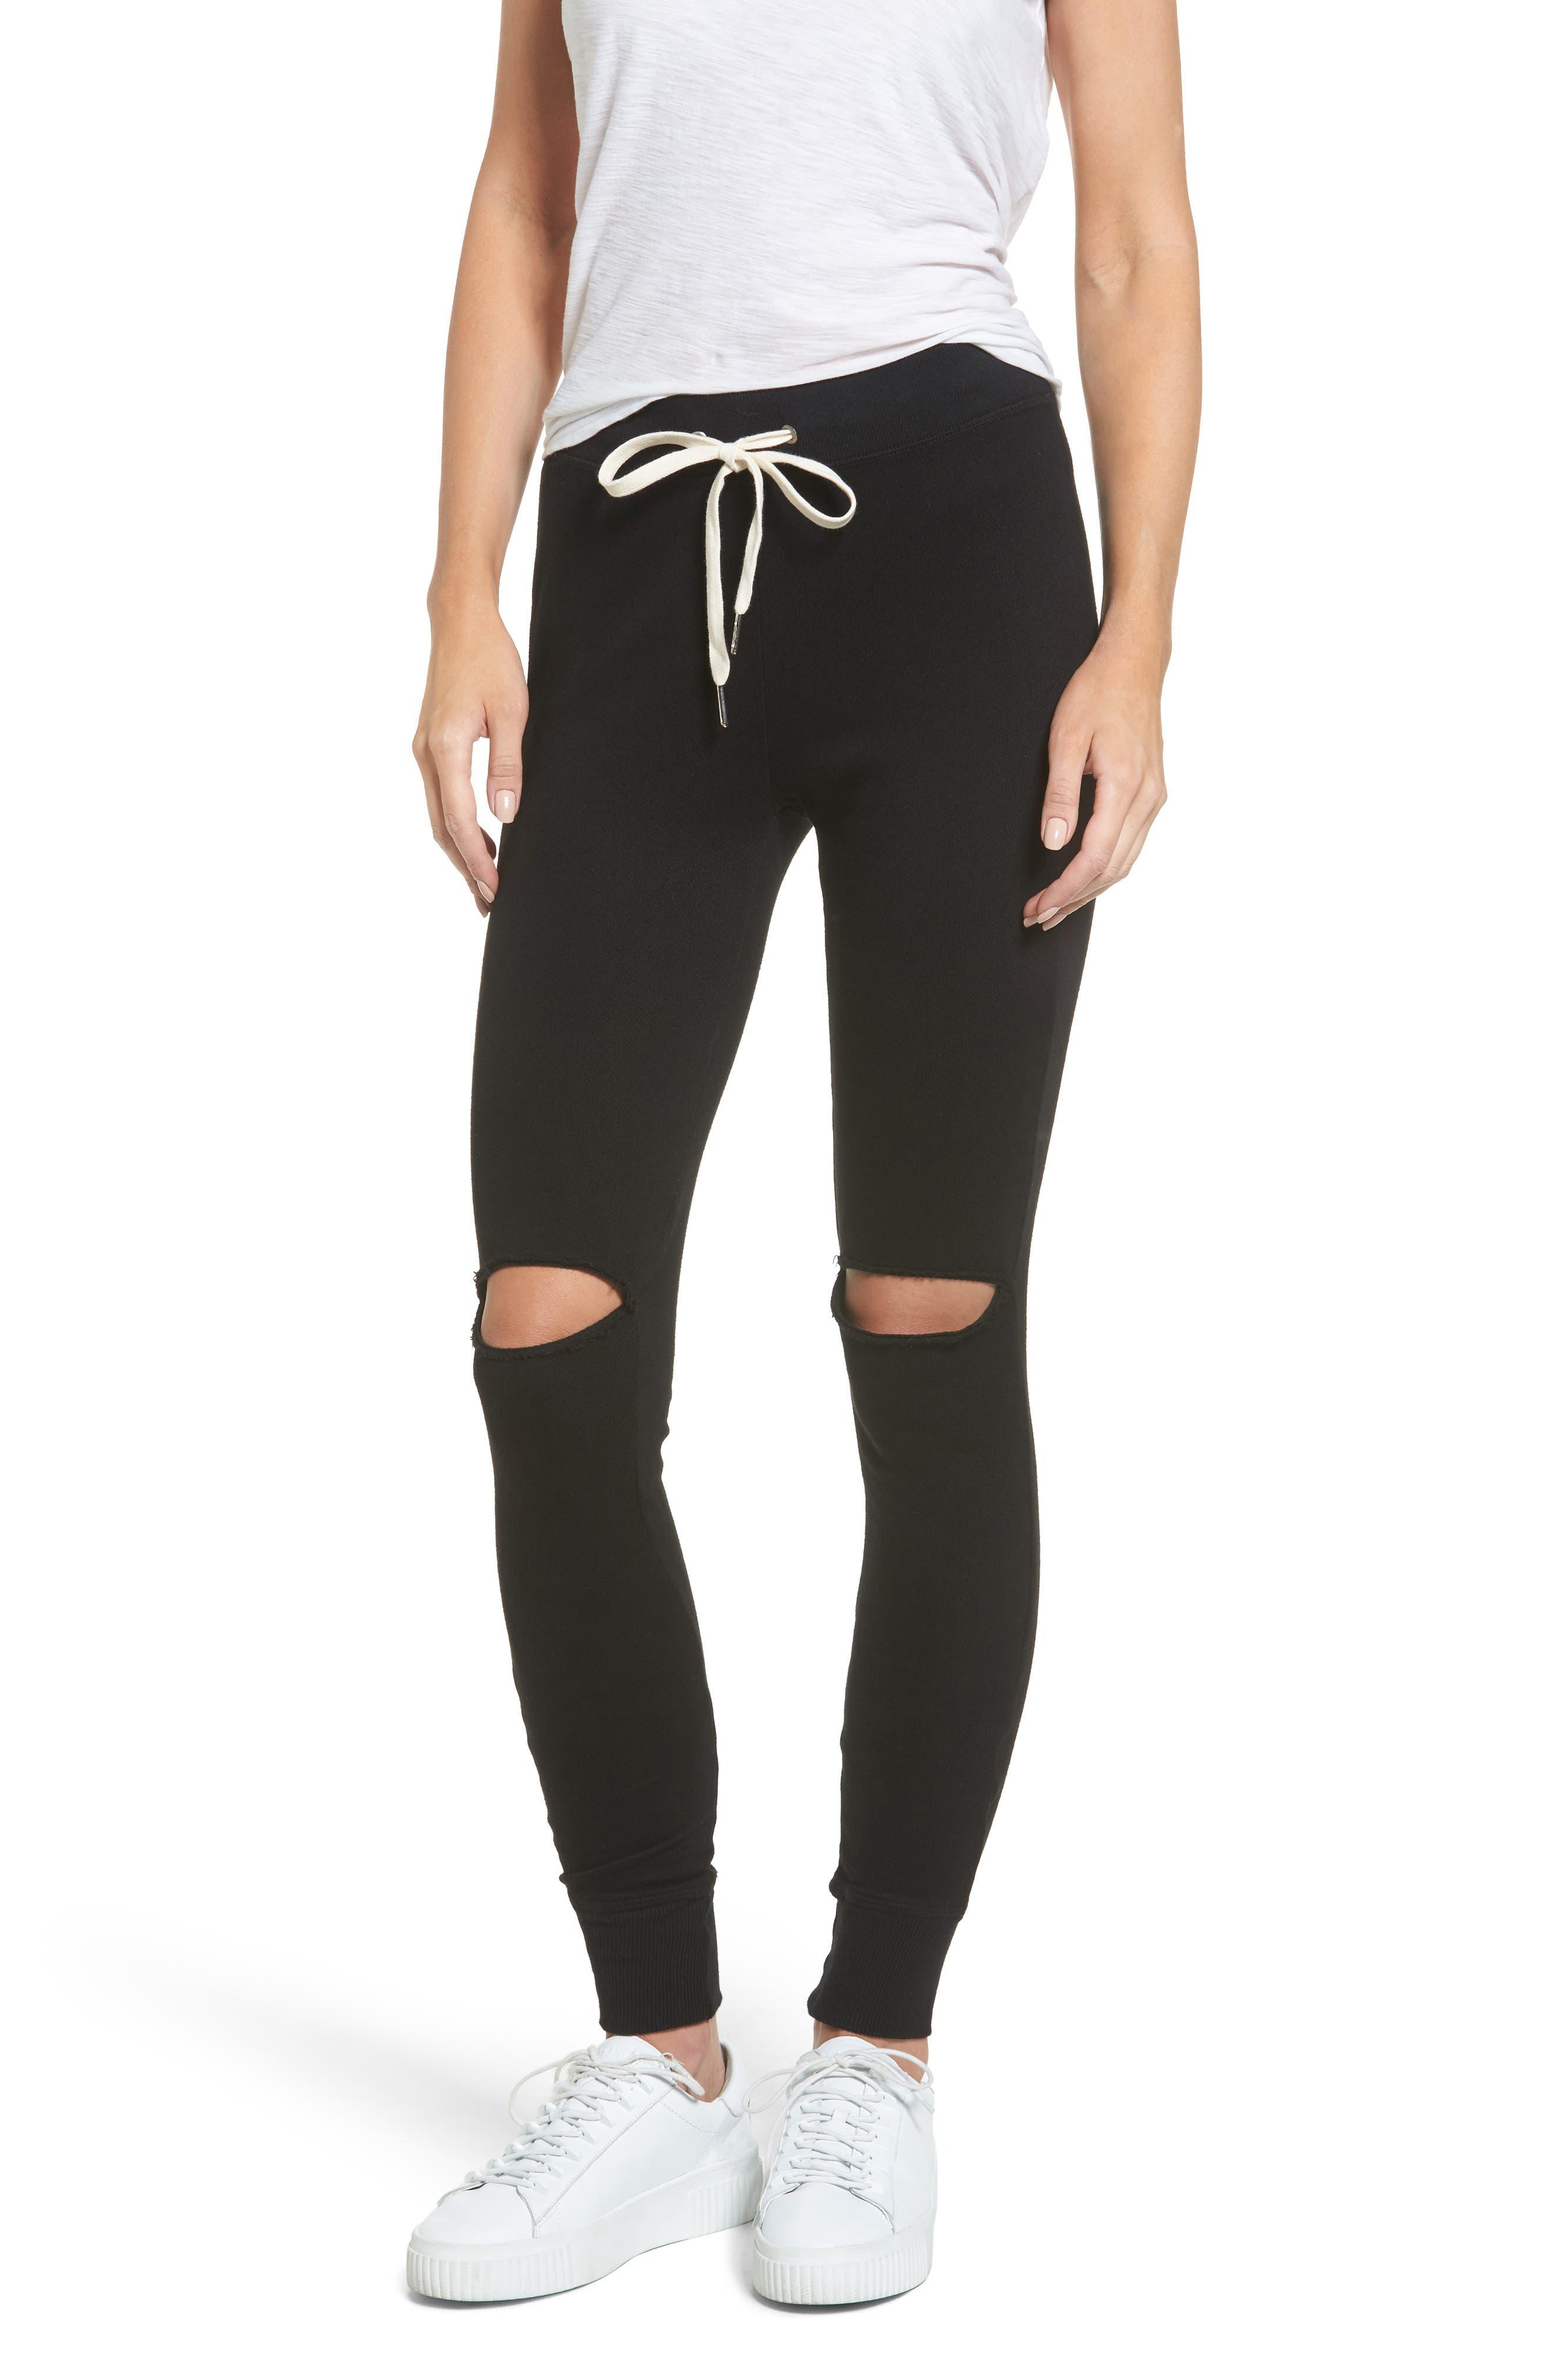 Ruthie Shredded Jogger Pants,                         Main,                         color, Black Cat